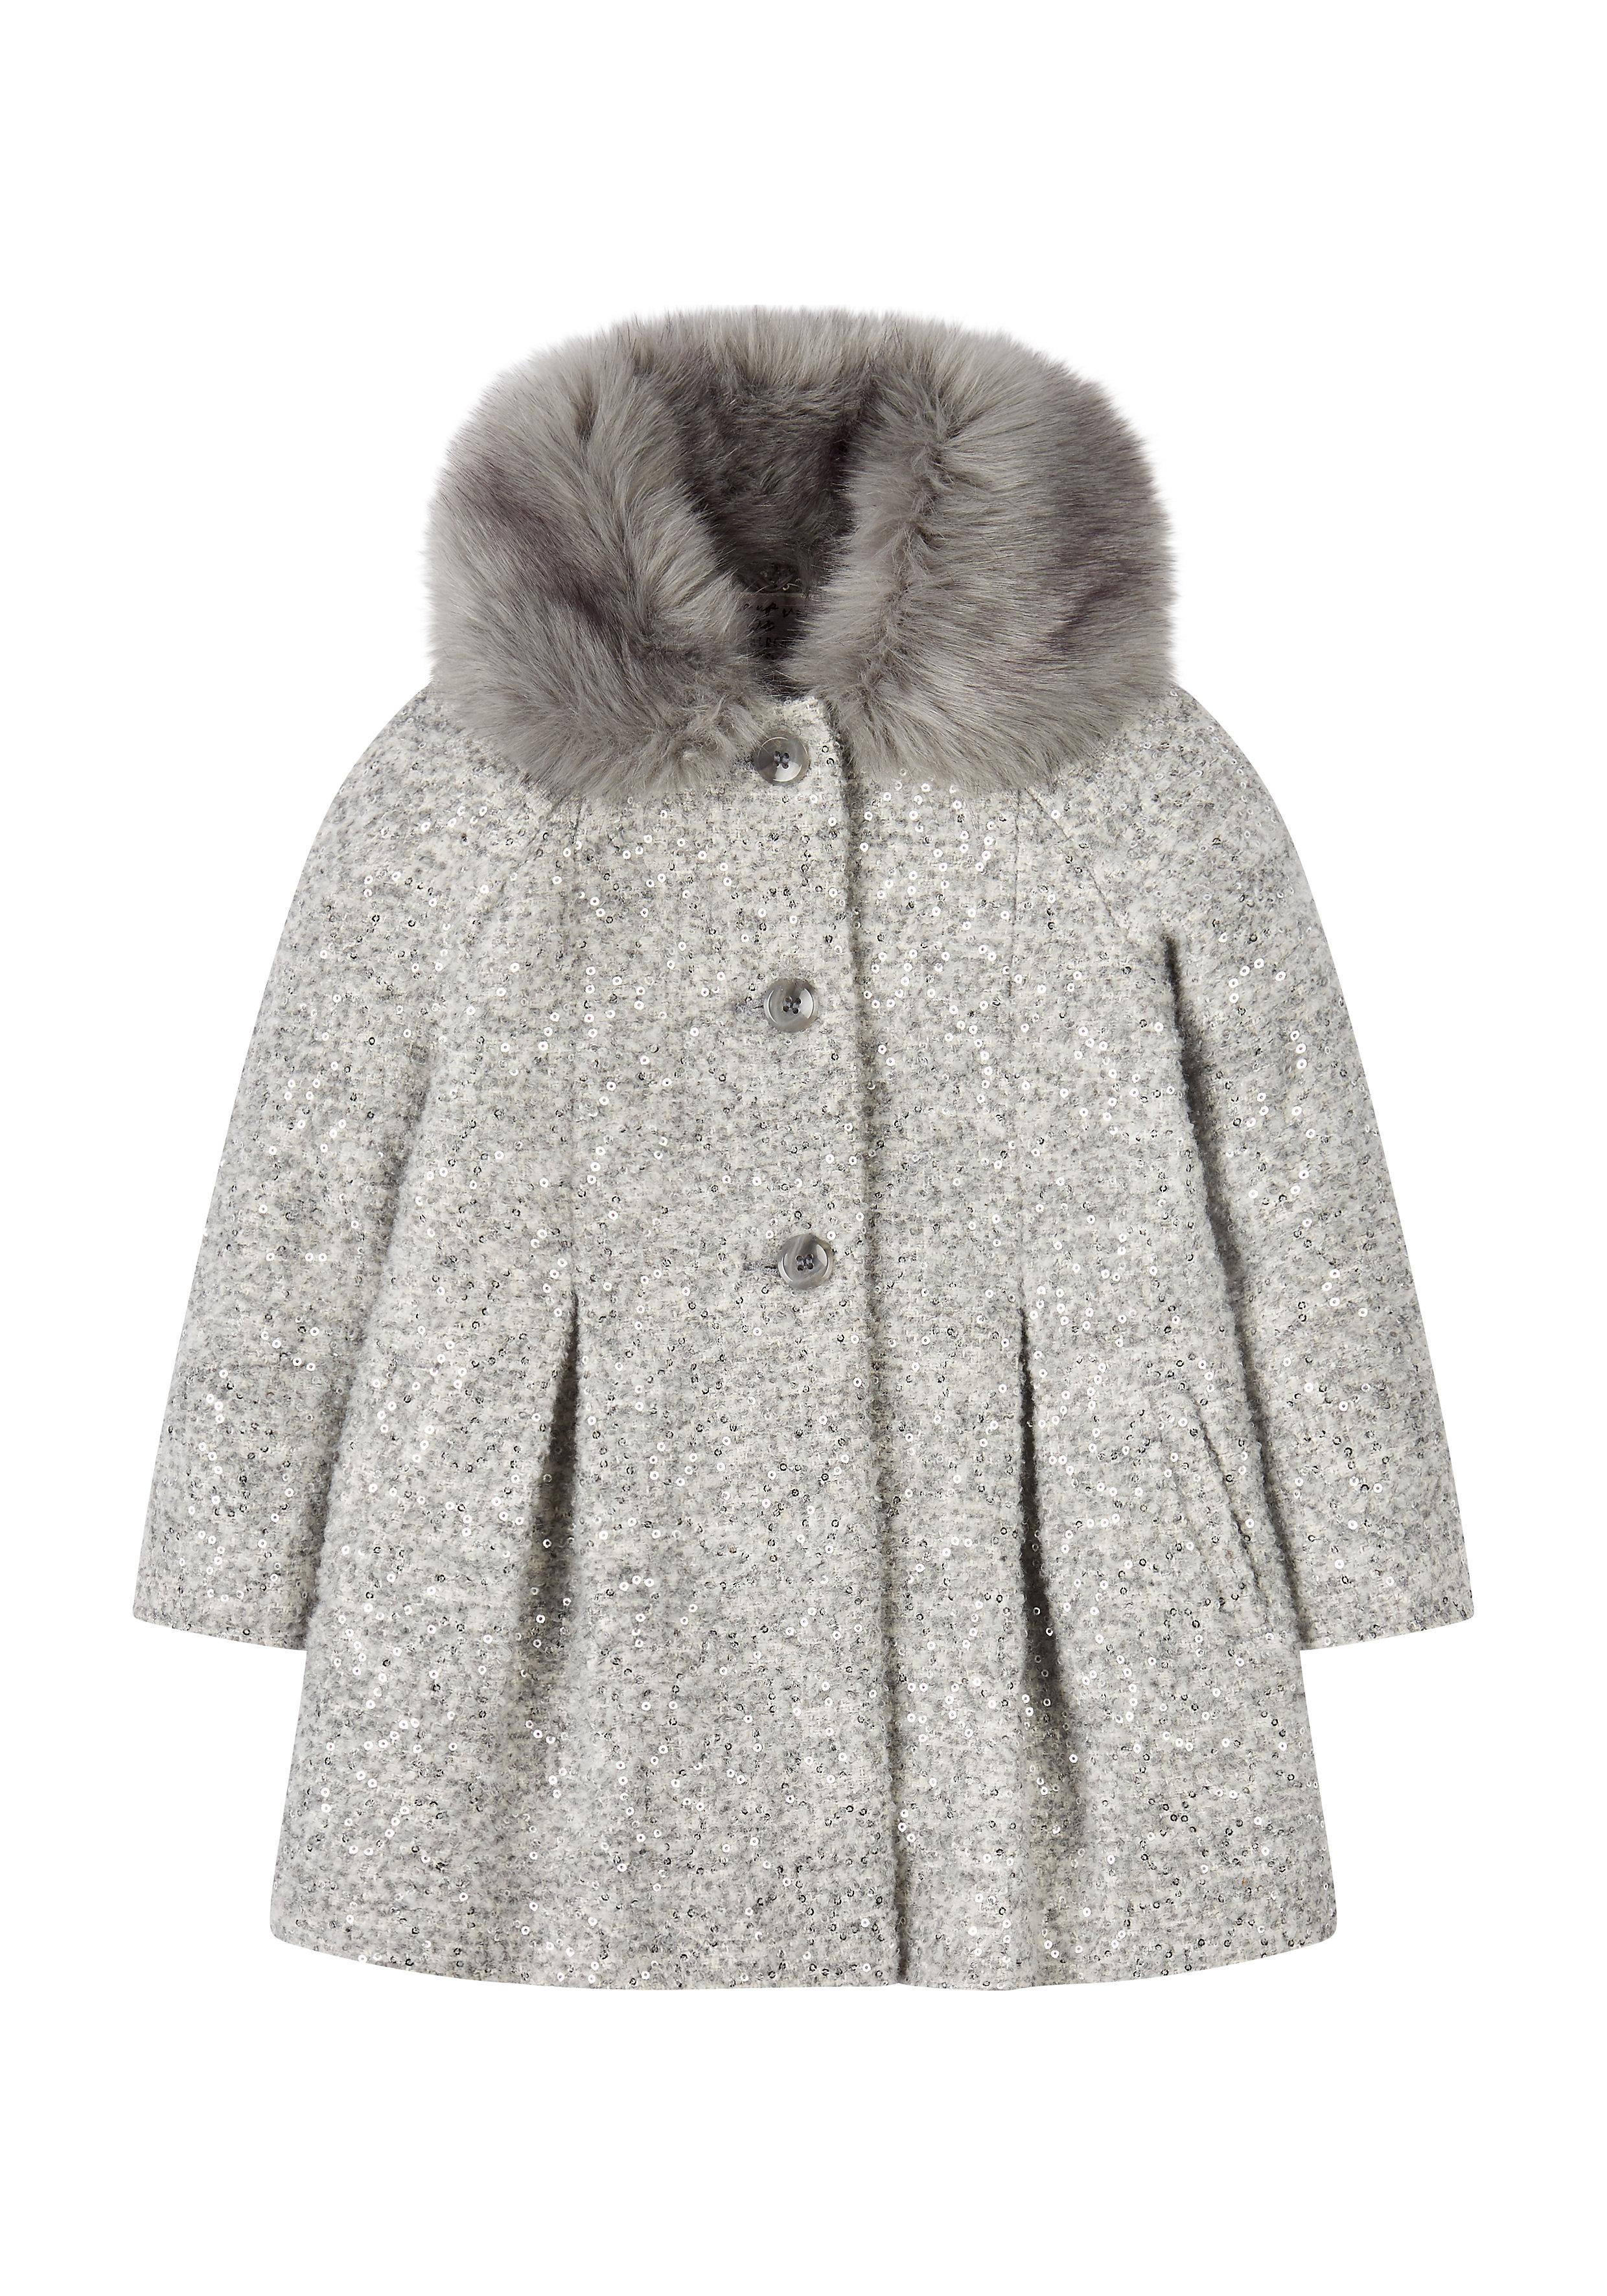 Mothercare | Girls Full Sleeves Coat Fur Collar - Grey